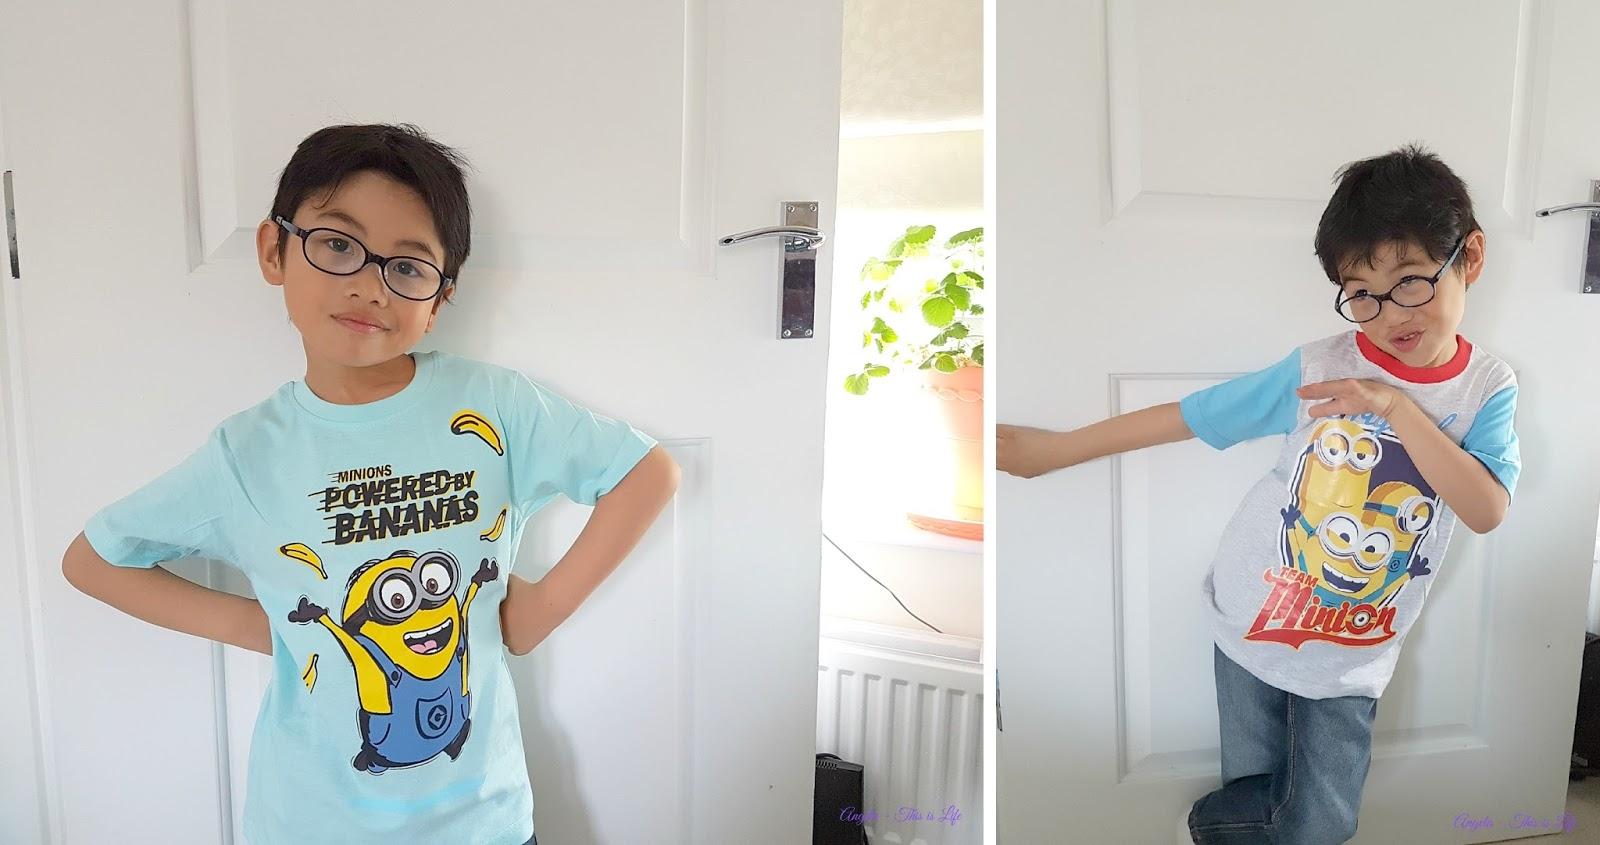 Minions, Despicable Me 3, Minions Clothes